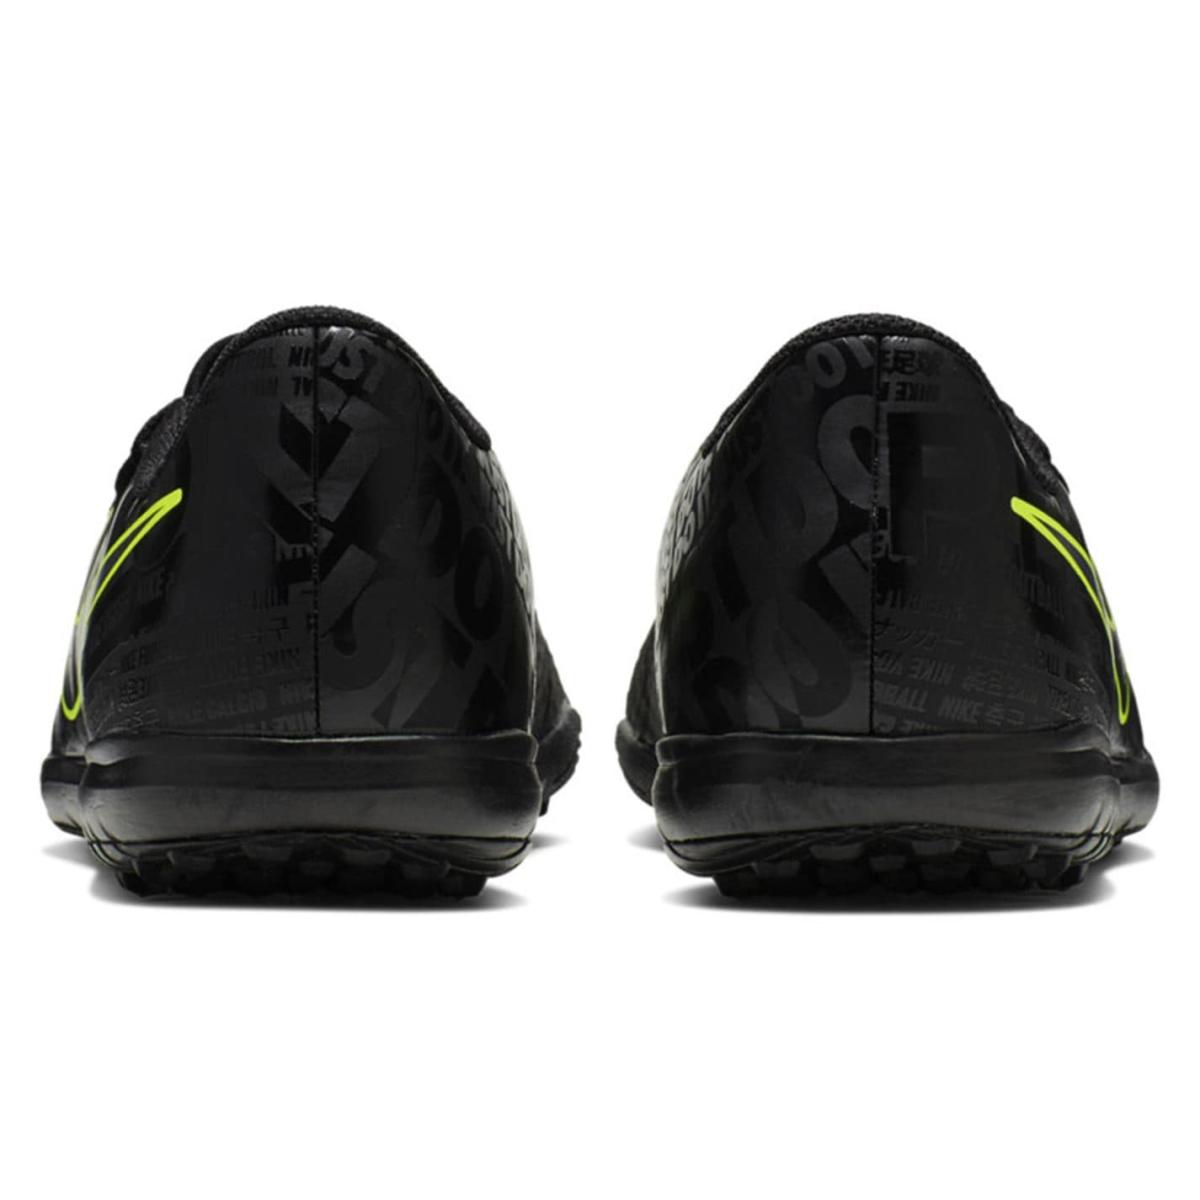 Nike Phantom Venom Academy Fußballschuhe Astro Turf AT Kinder Jungen 1074